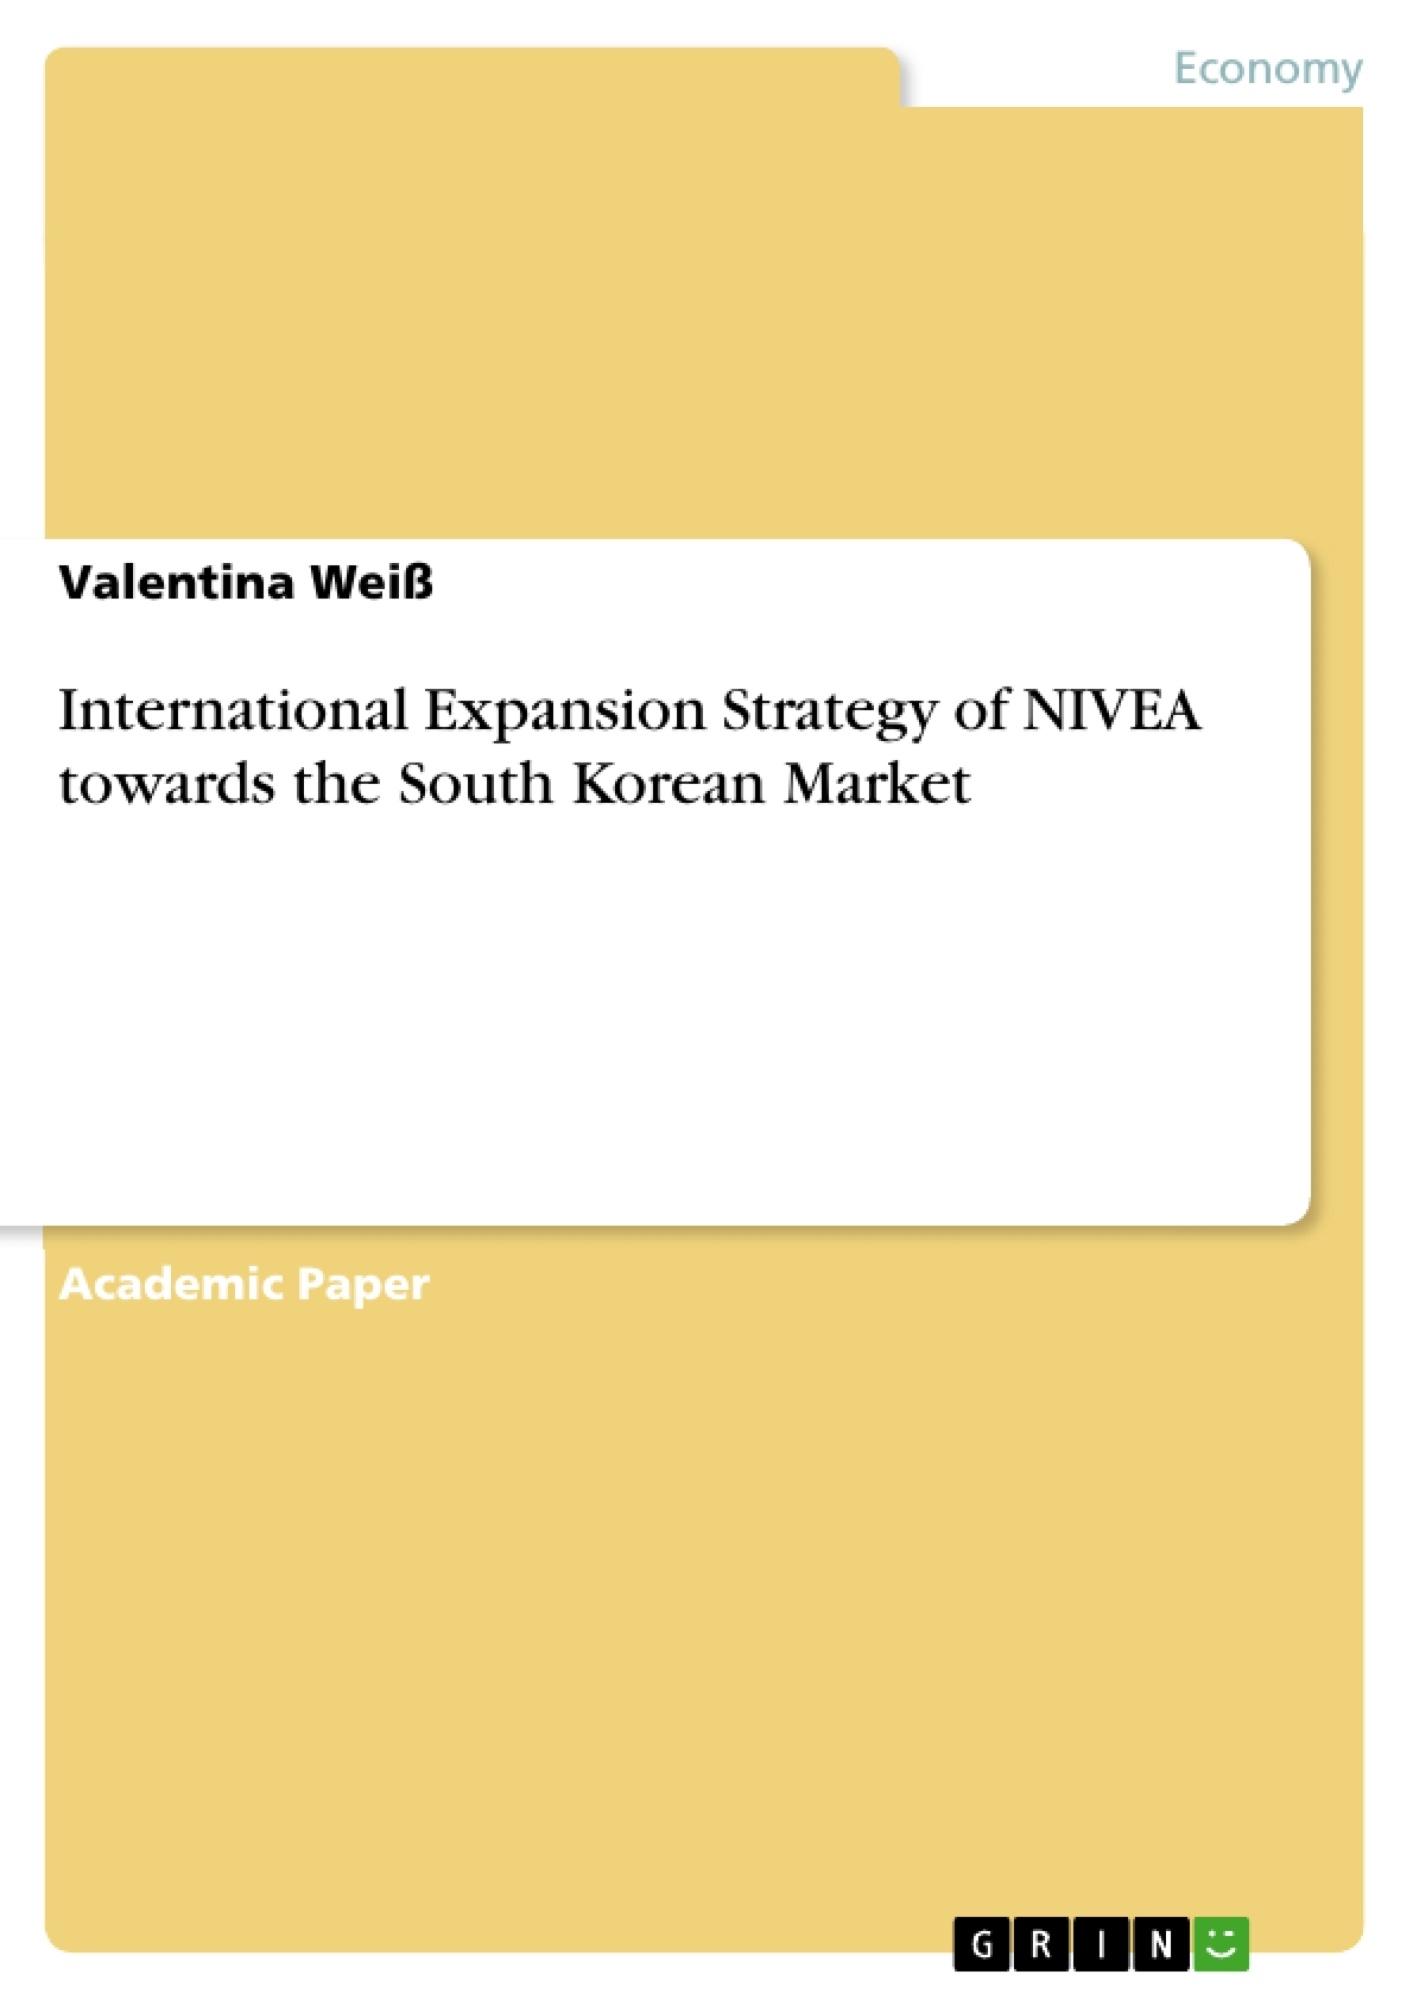 Title: International Expansion Strategy of NIVEA towards the South Korean Market